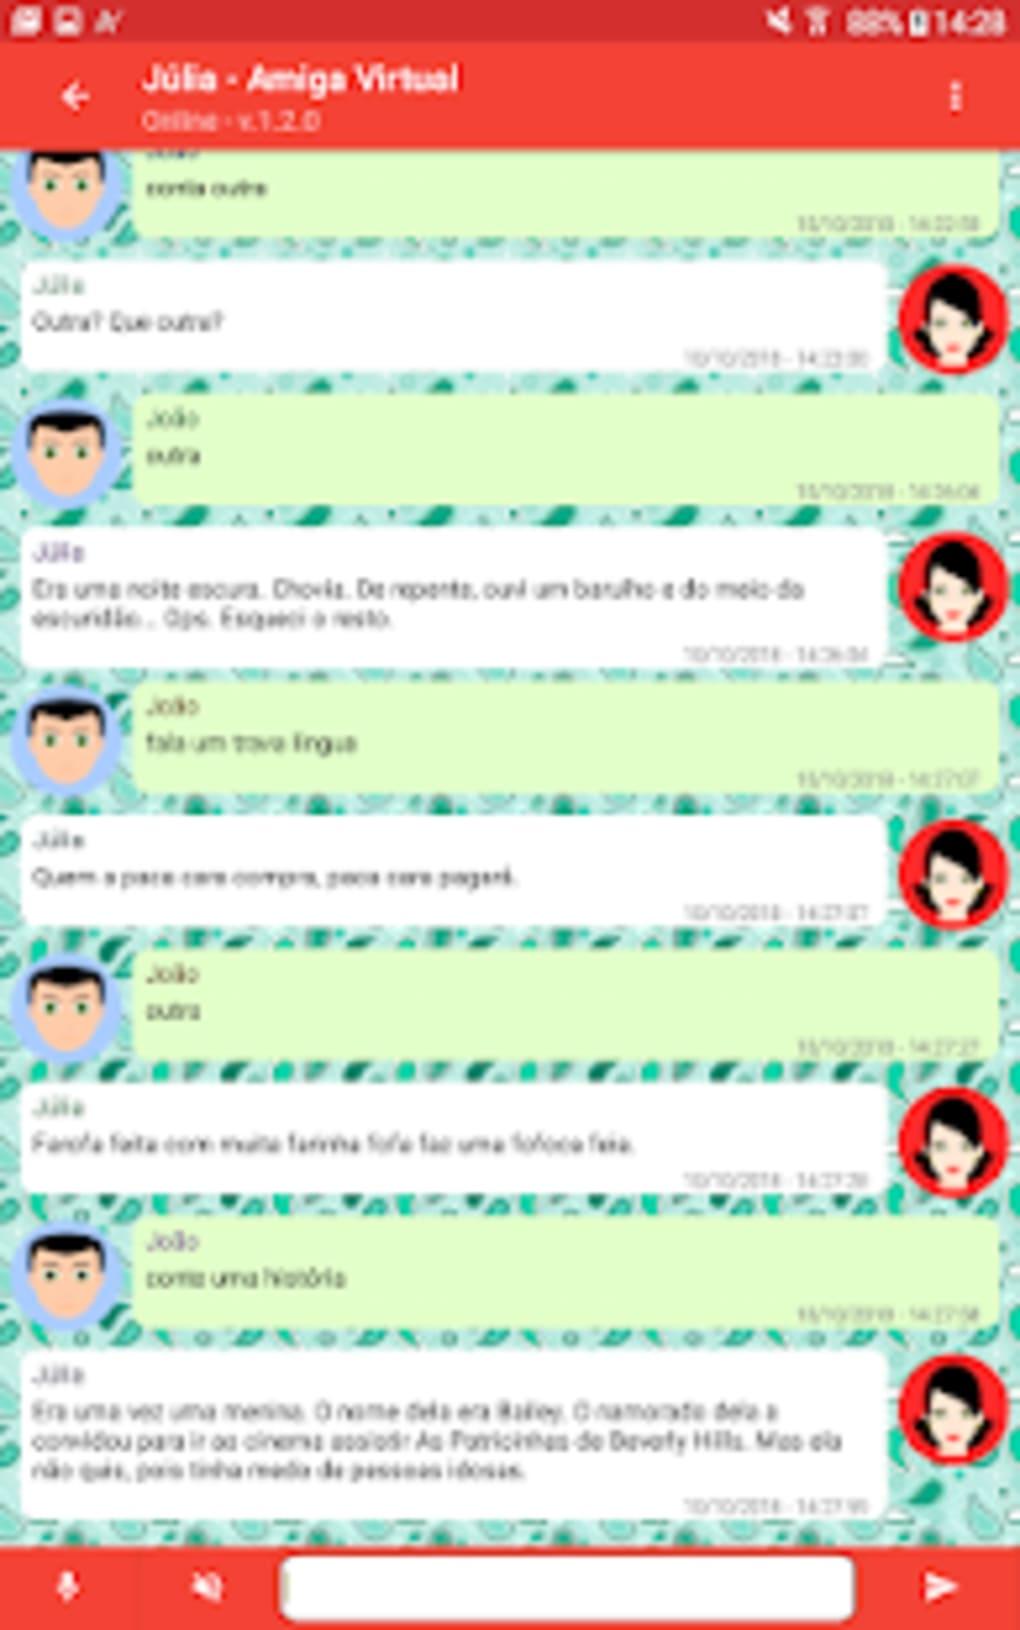 Júlia - Amiga Virtual e chatbot em português  para Android - Download